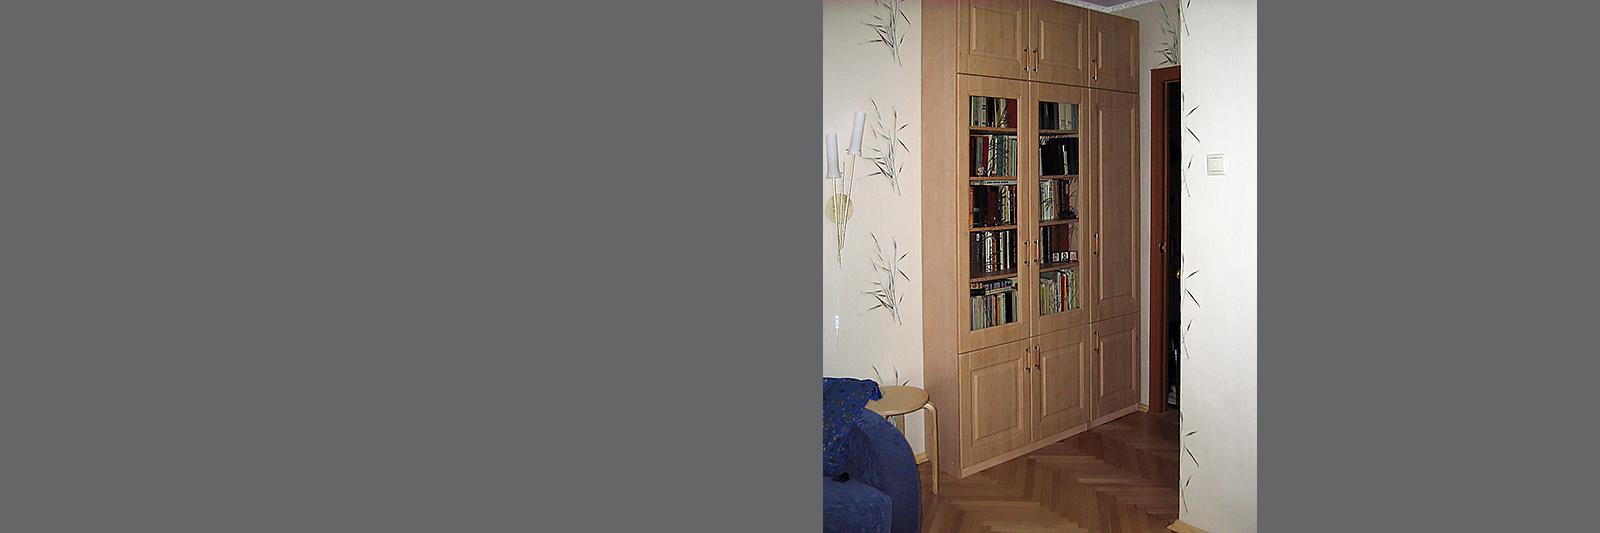 Книжный шкаф на заказ с фасадами из МДФ